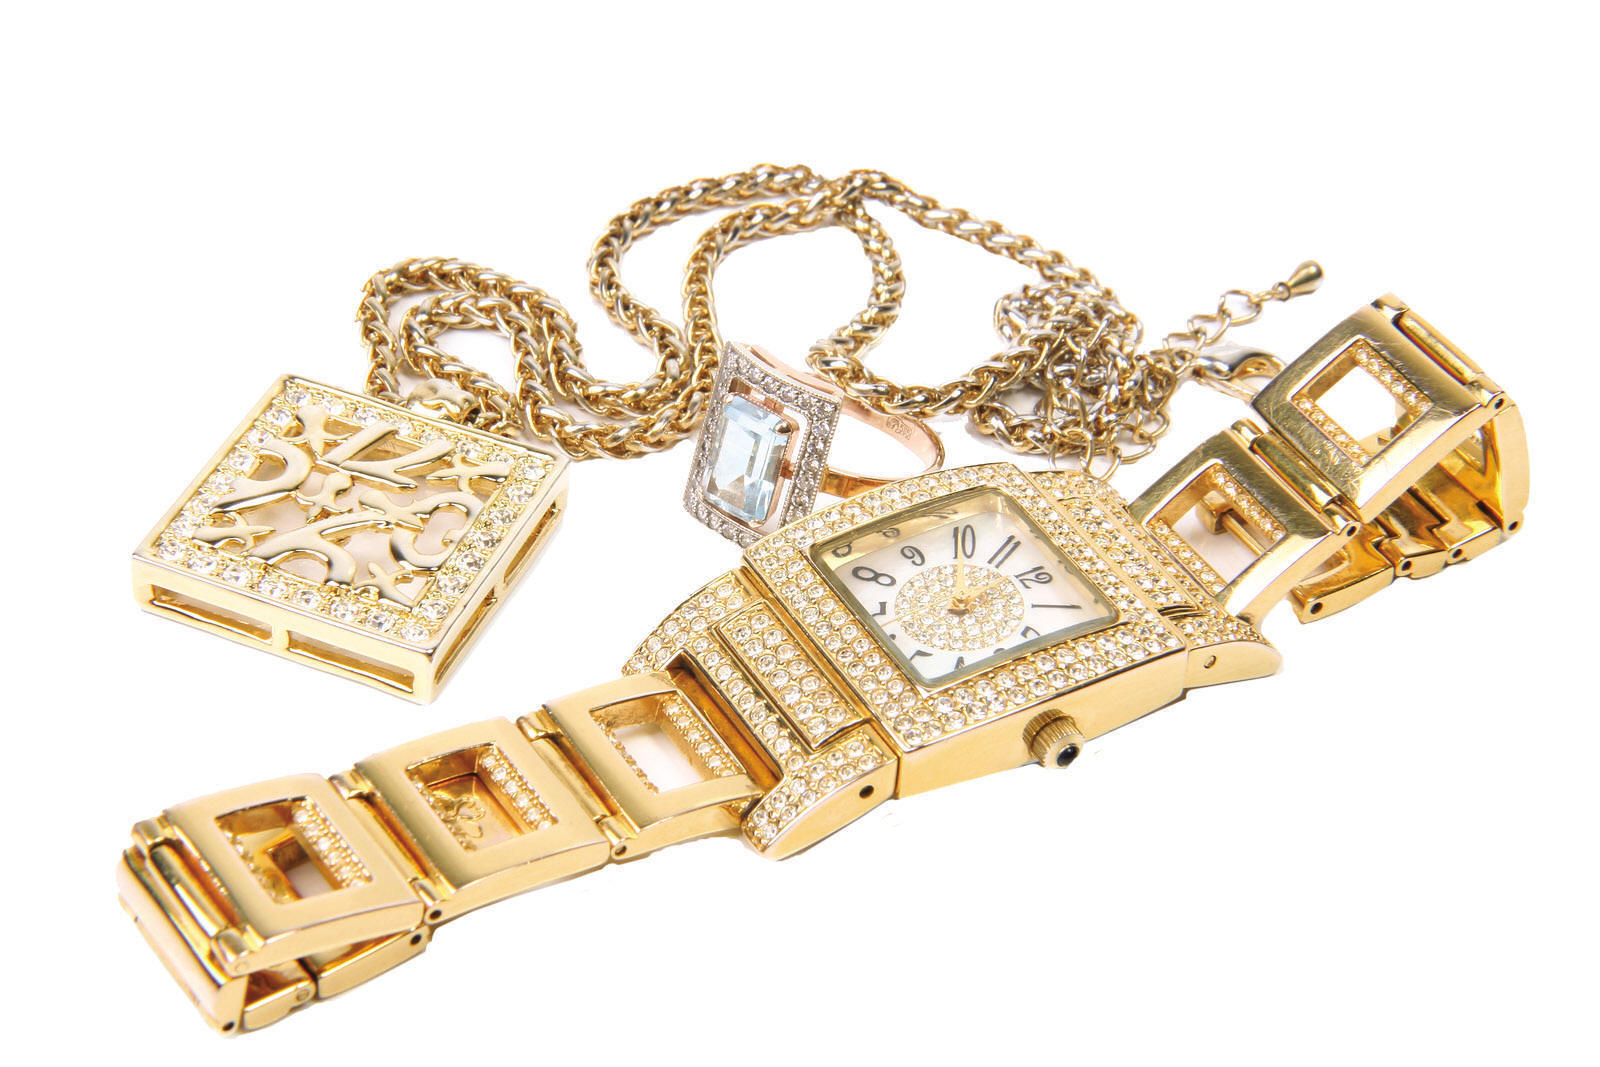 Gold and Diamond Buyers San Diego